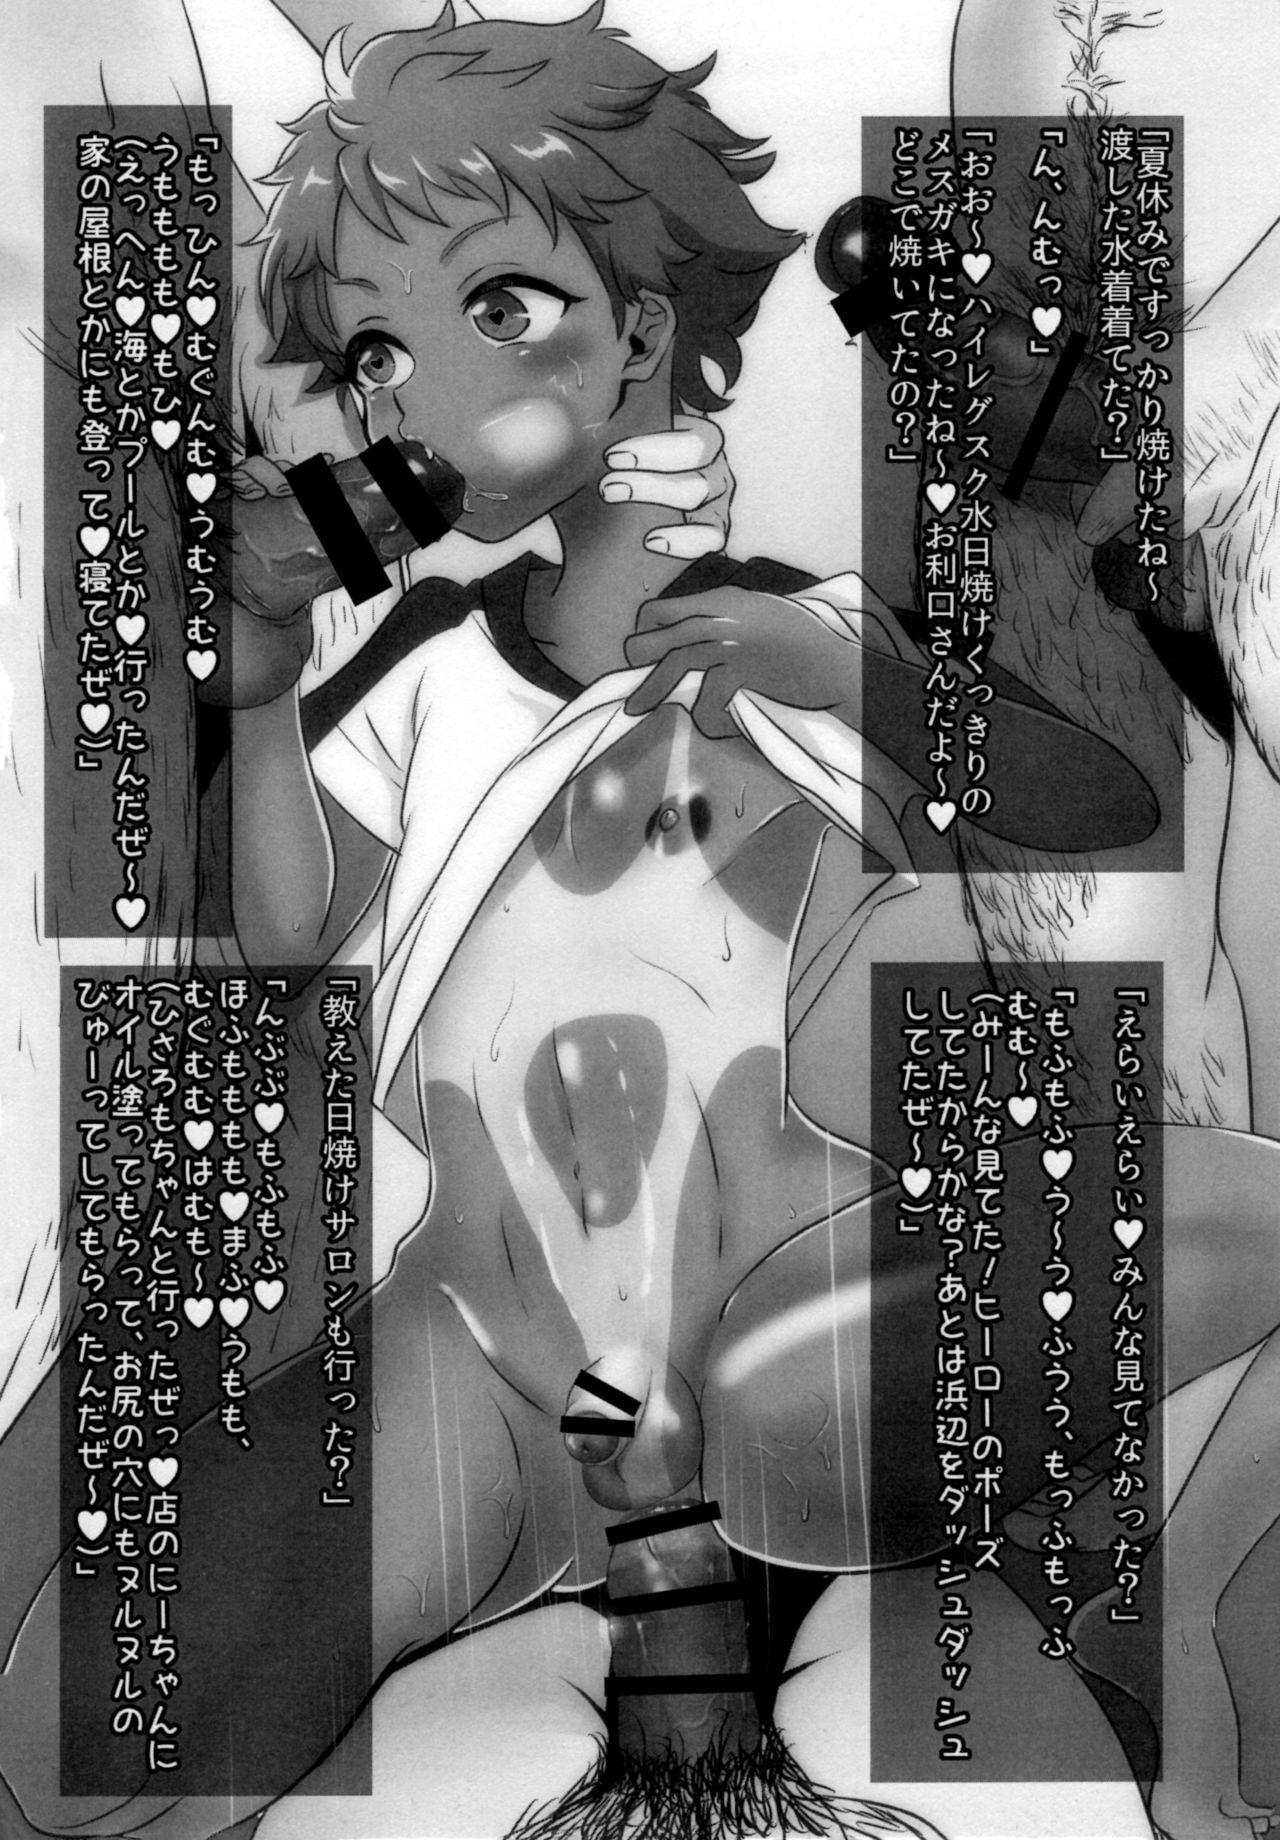 Yumenosaki Matomete Minna Saimin Kan 4